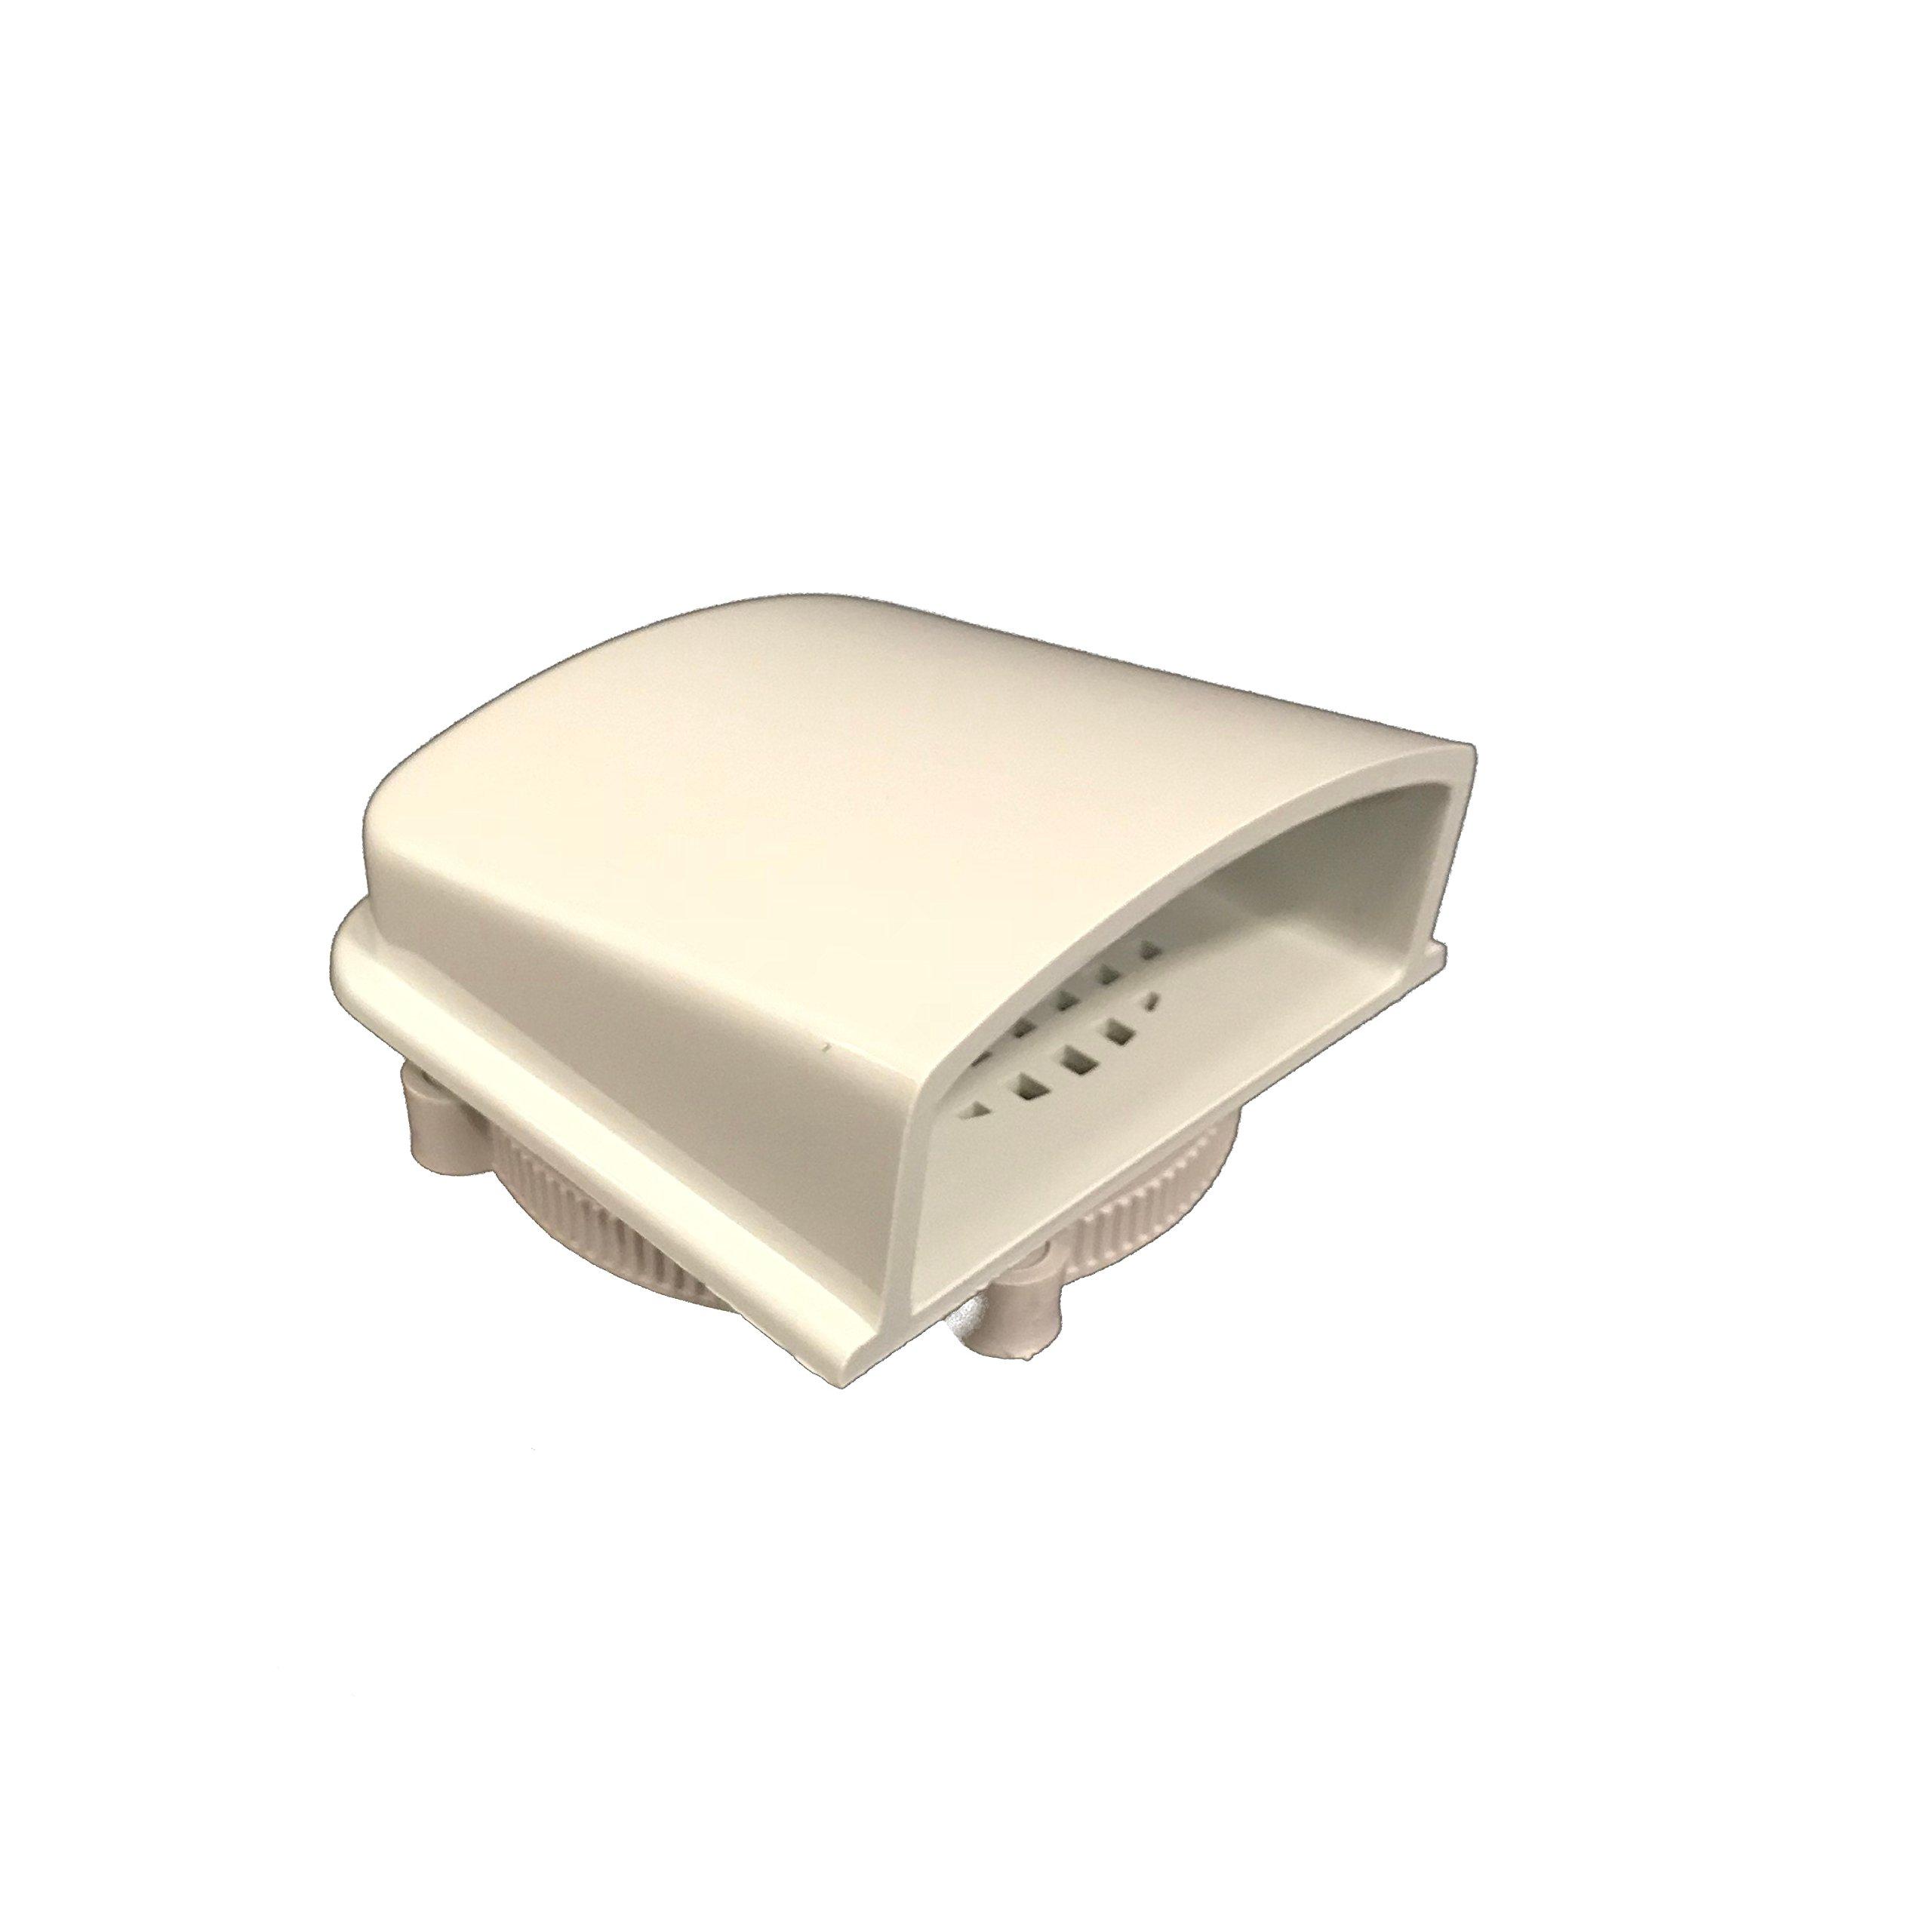 BUD Industries IPV-1115 IP32 Air Vent, 3.2'' x 3.2''